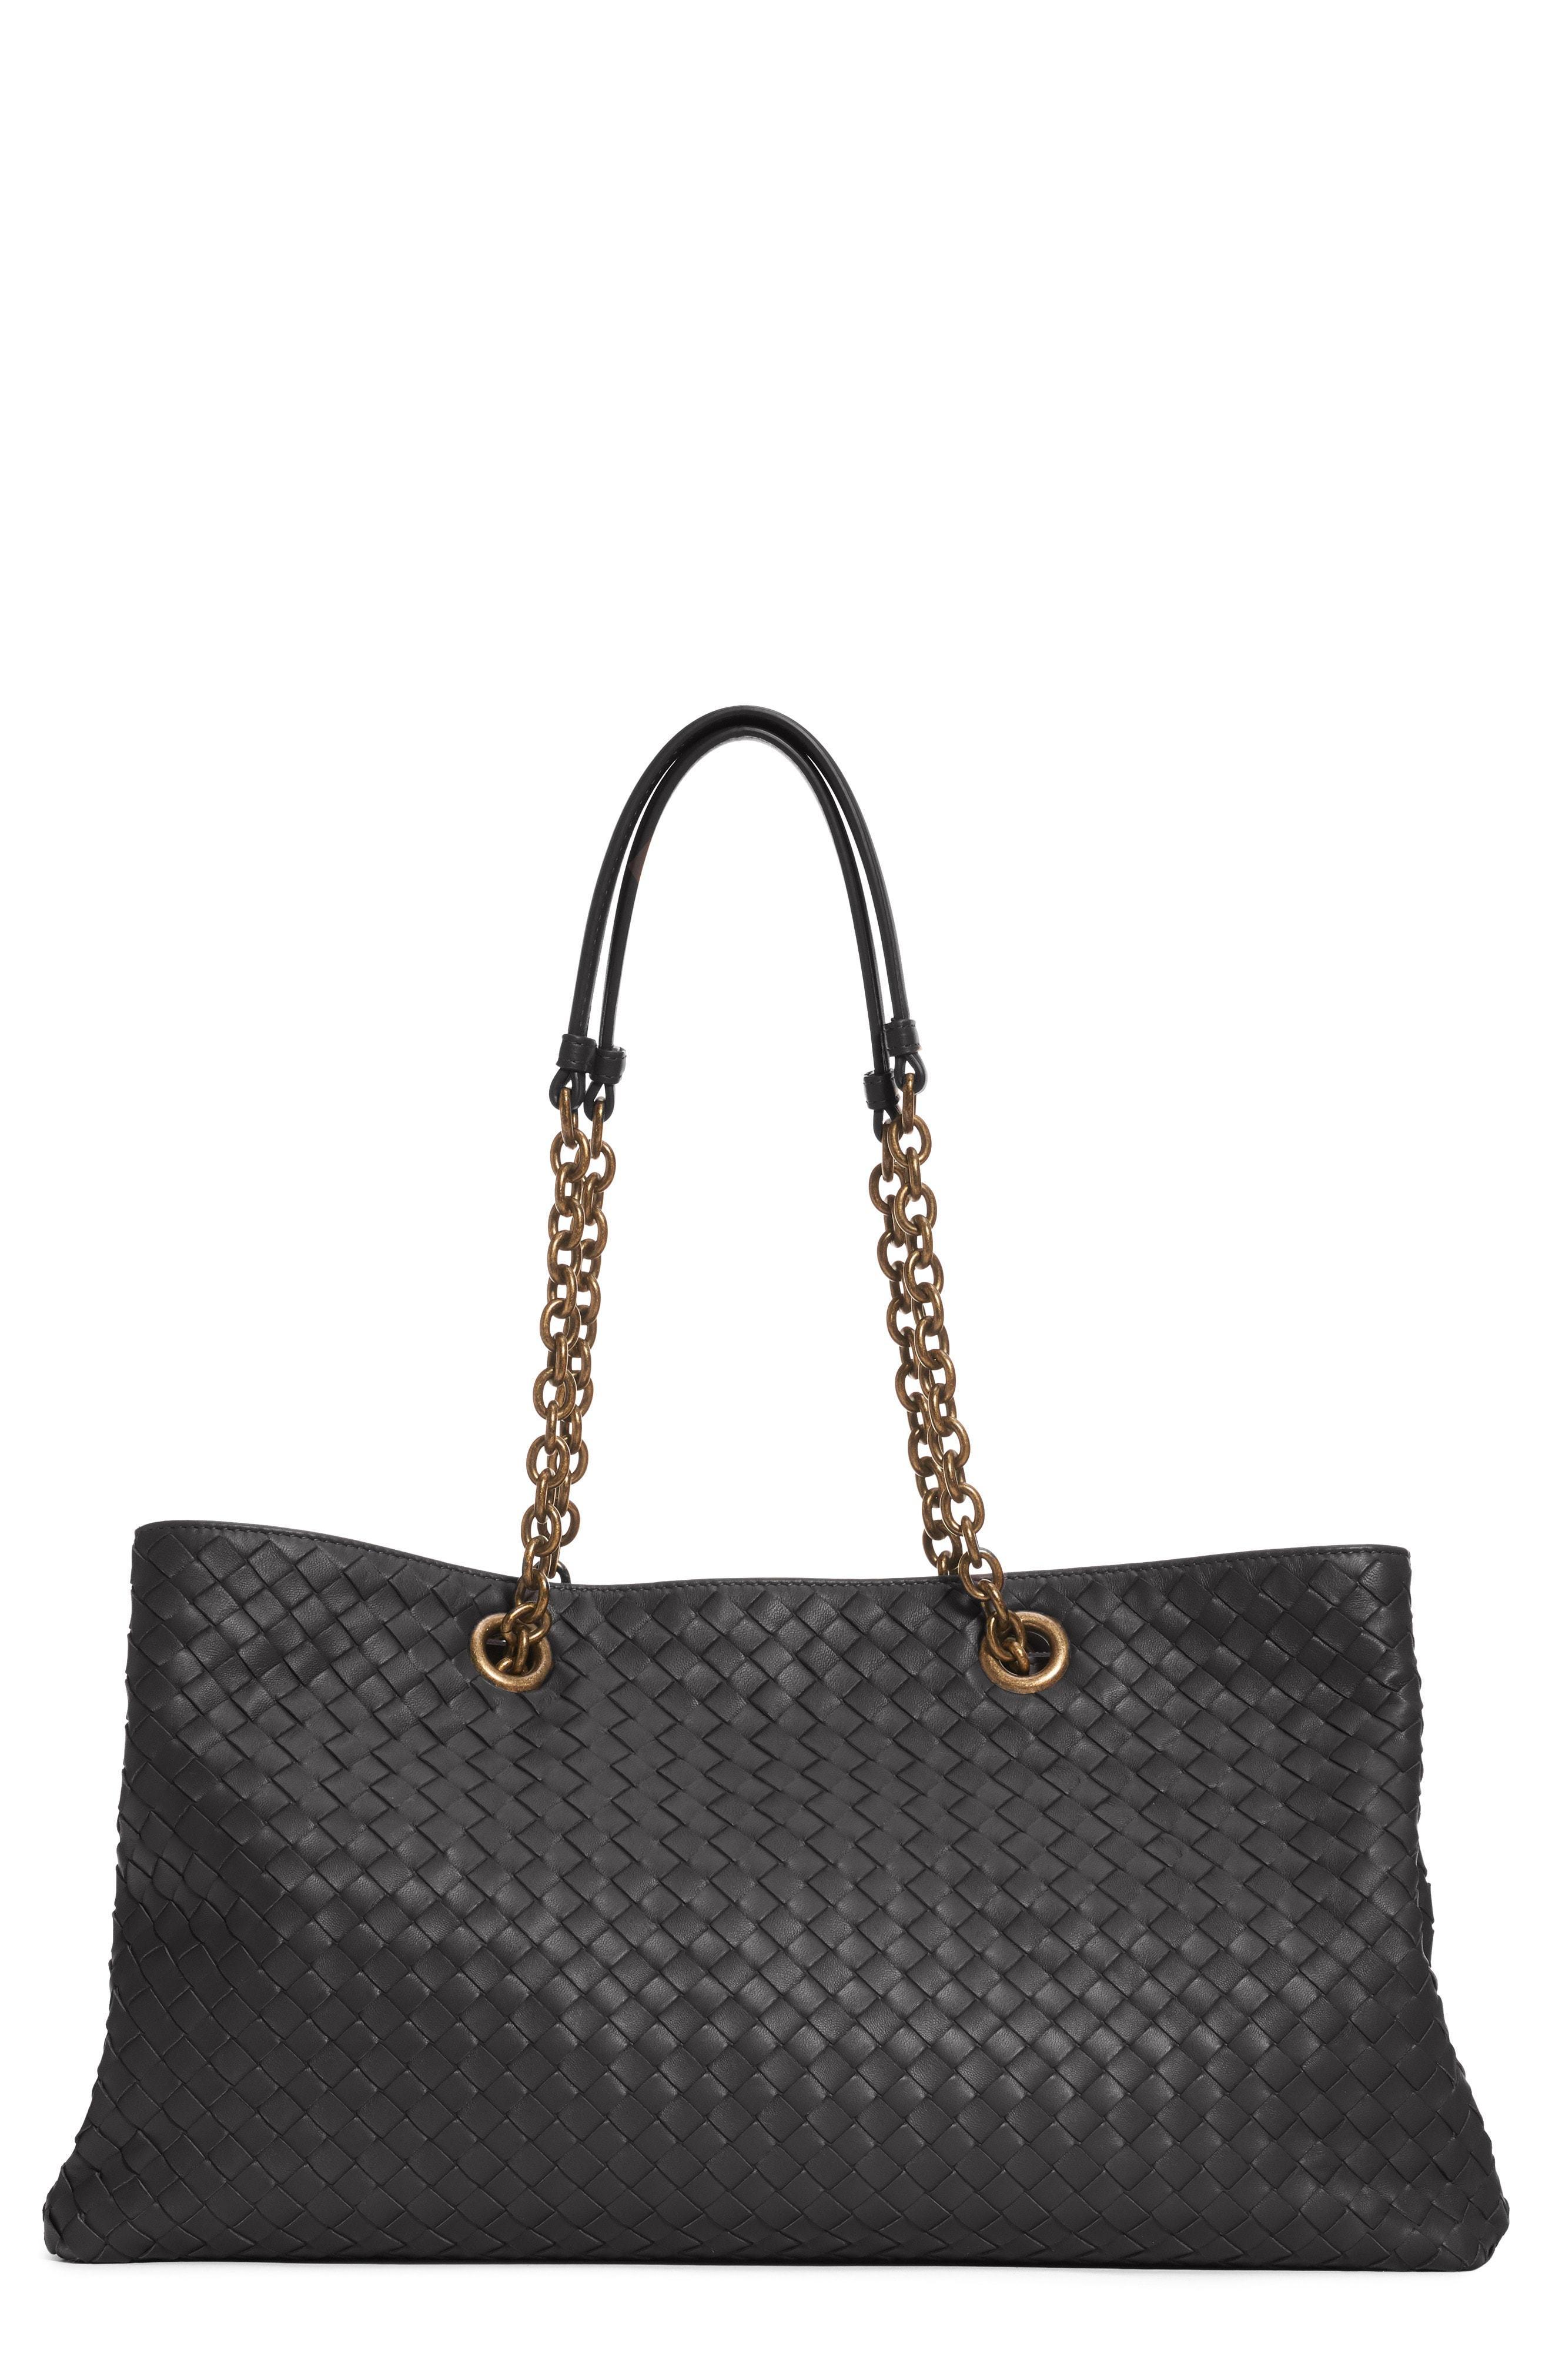 Bottega Veneta Intrecciato Eastwest Leather Tote Bag